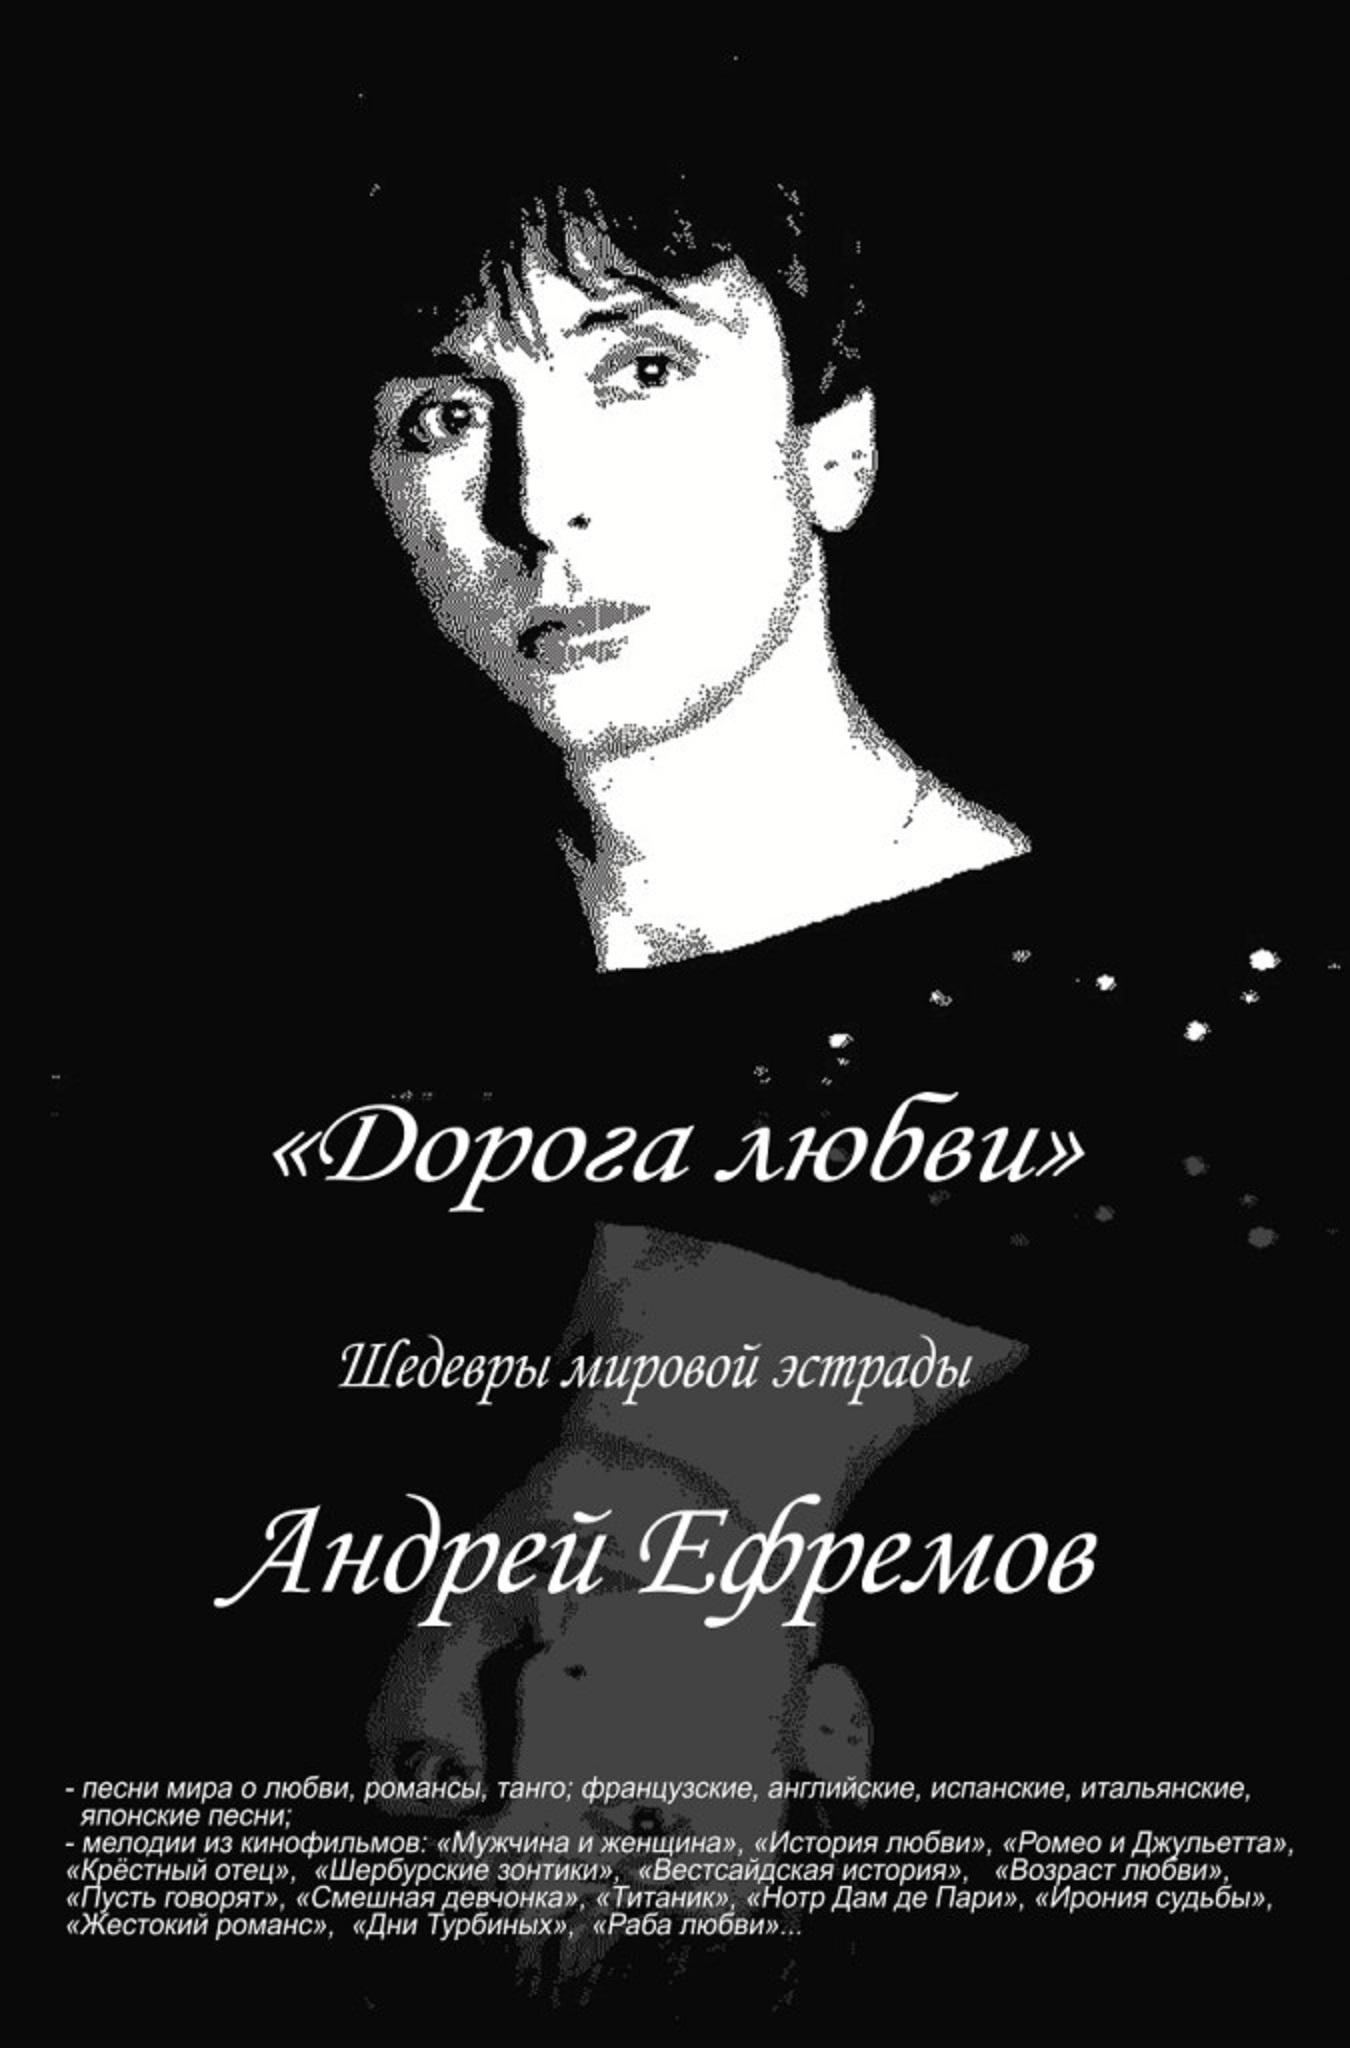 http://andreyefremov.ru/POSTERS/post4.jpg